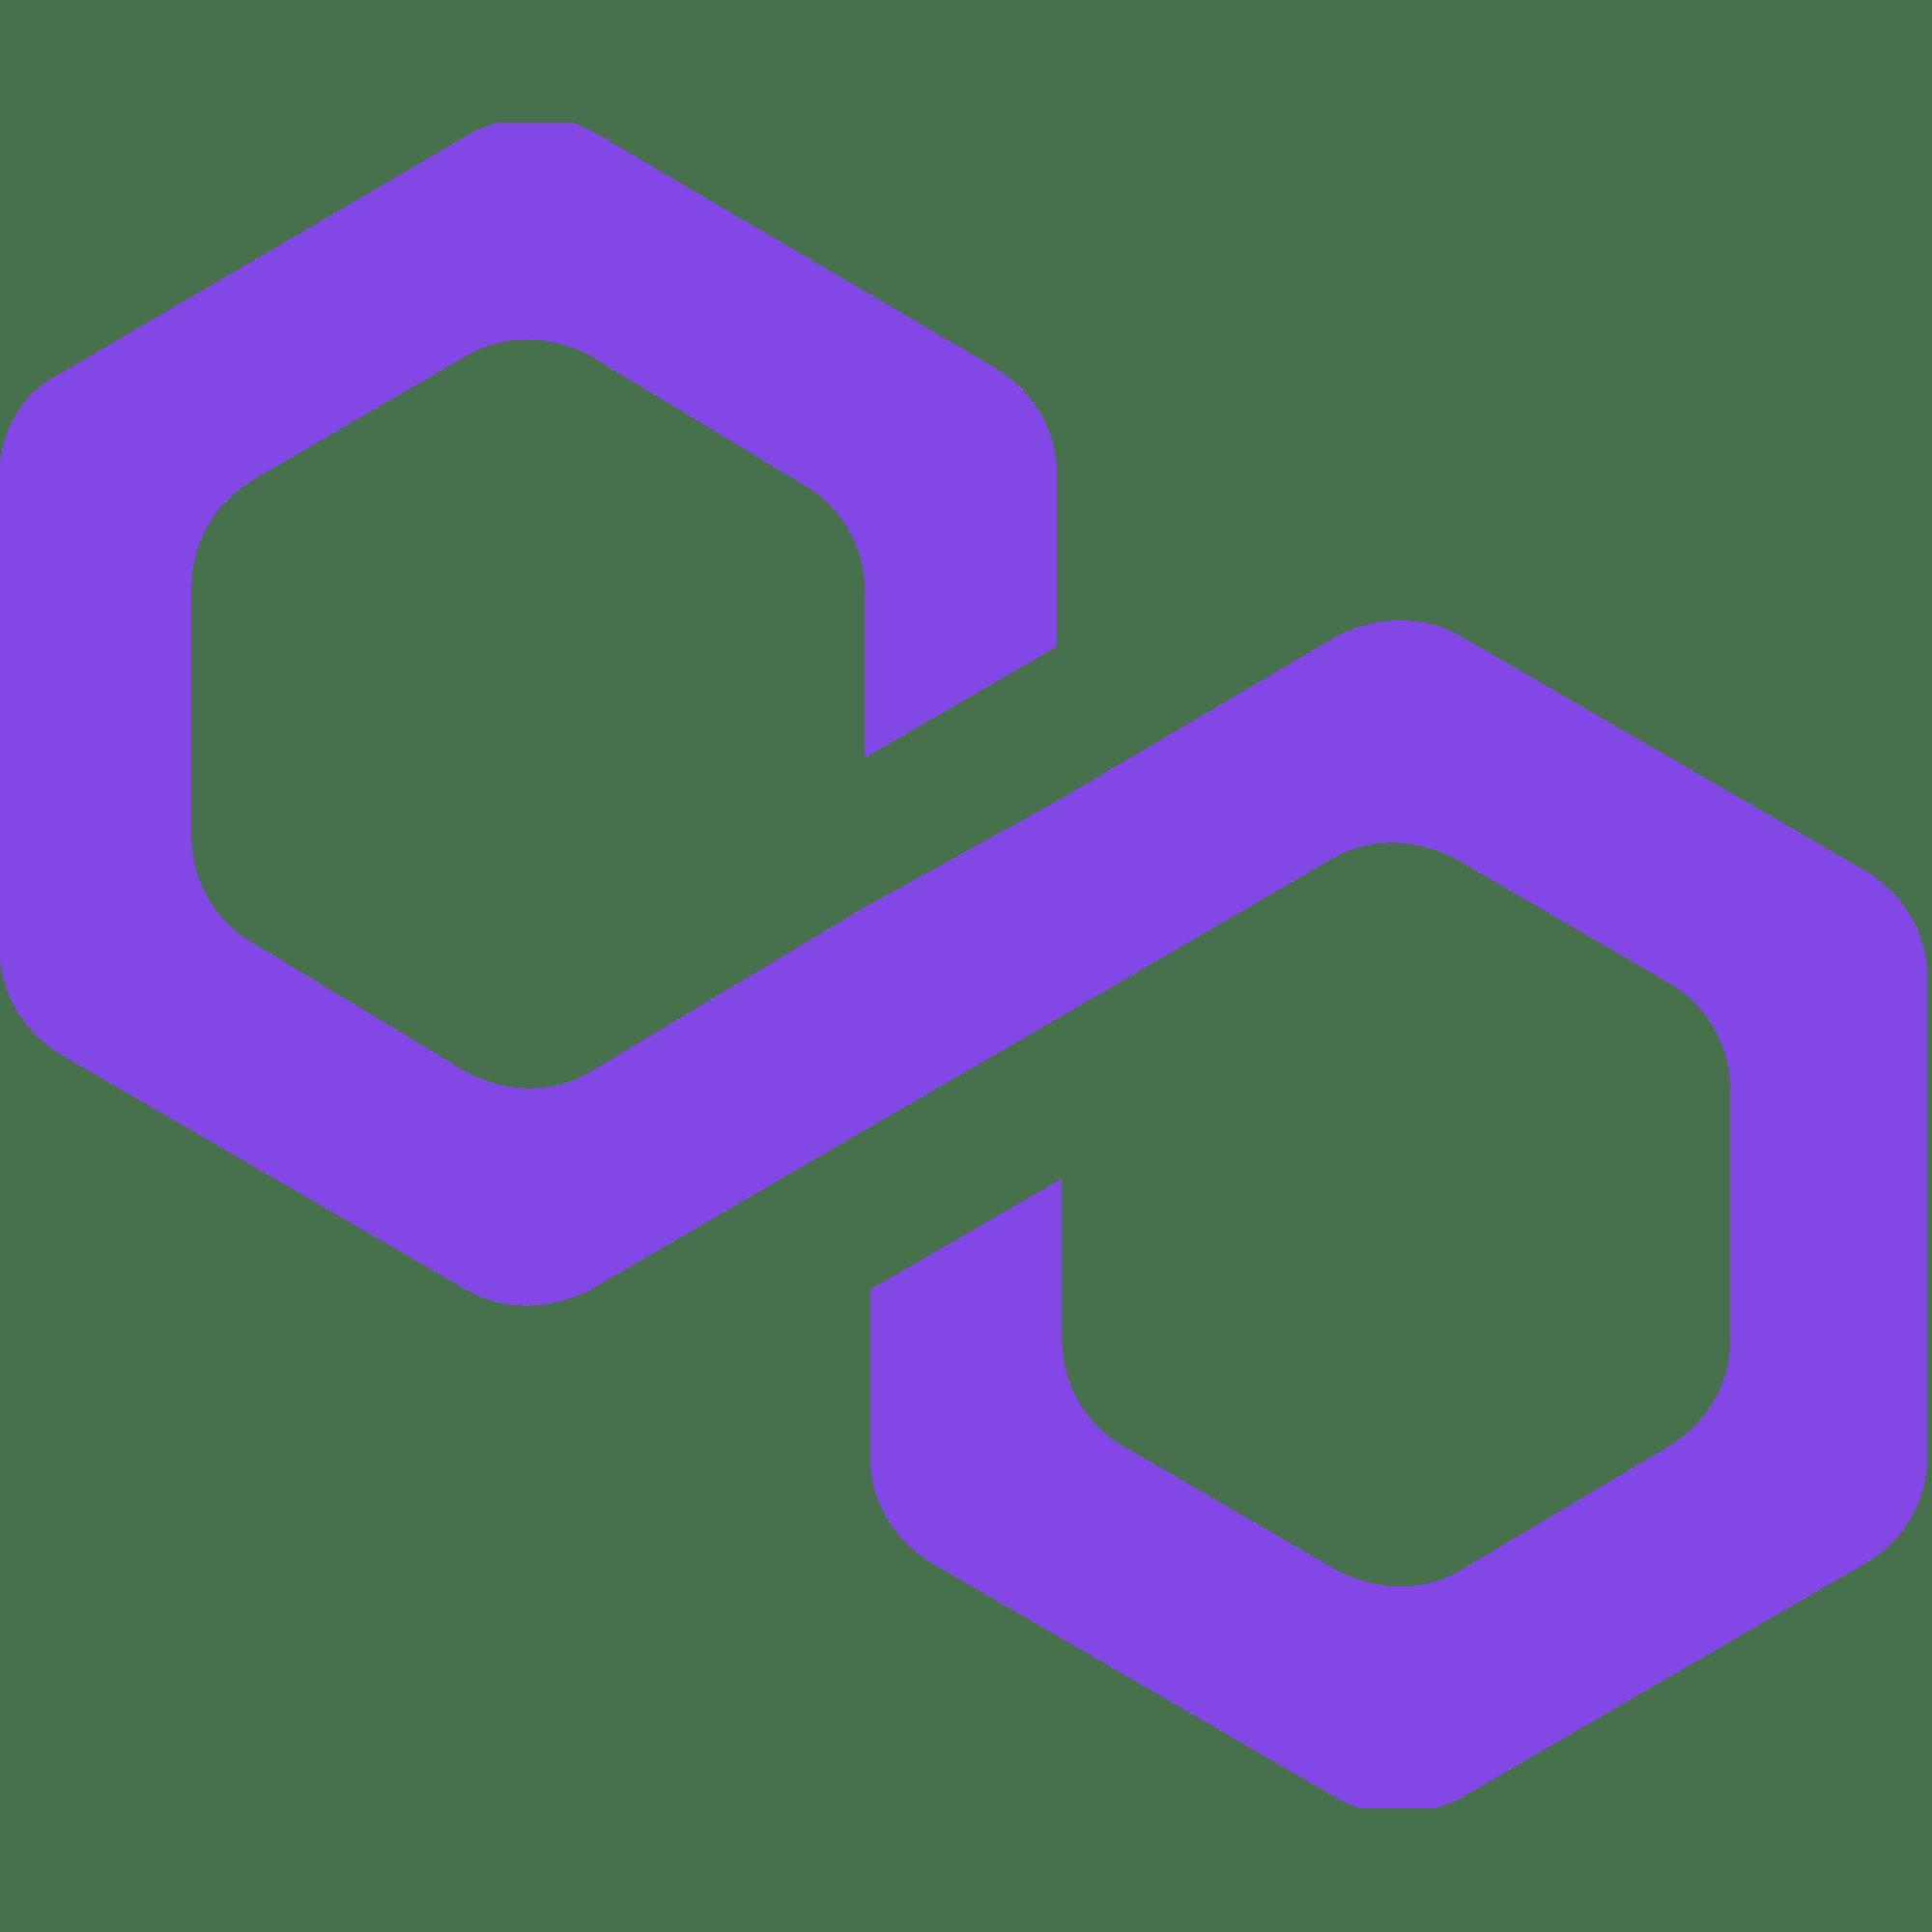 polygon matic coin logo I Cryptofalka